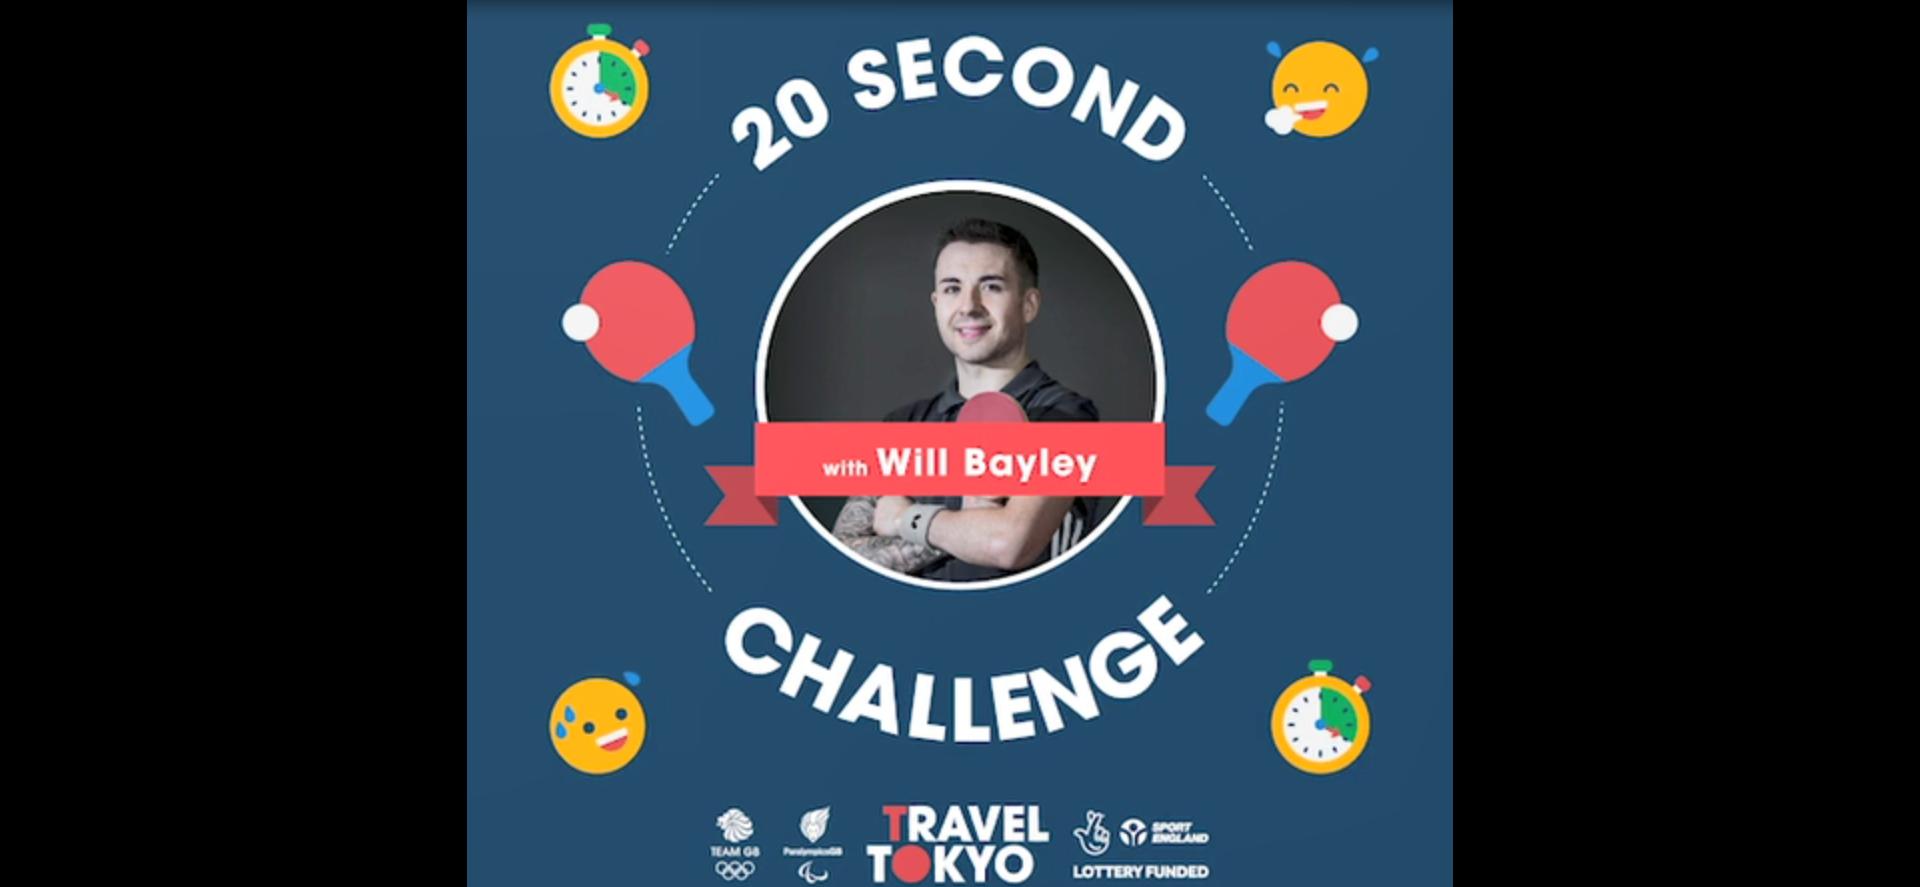 Will Bayley's challenge